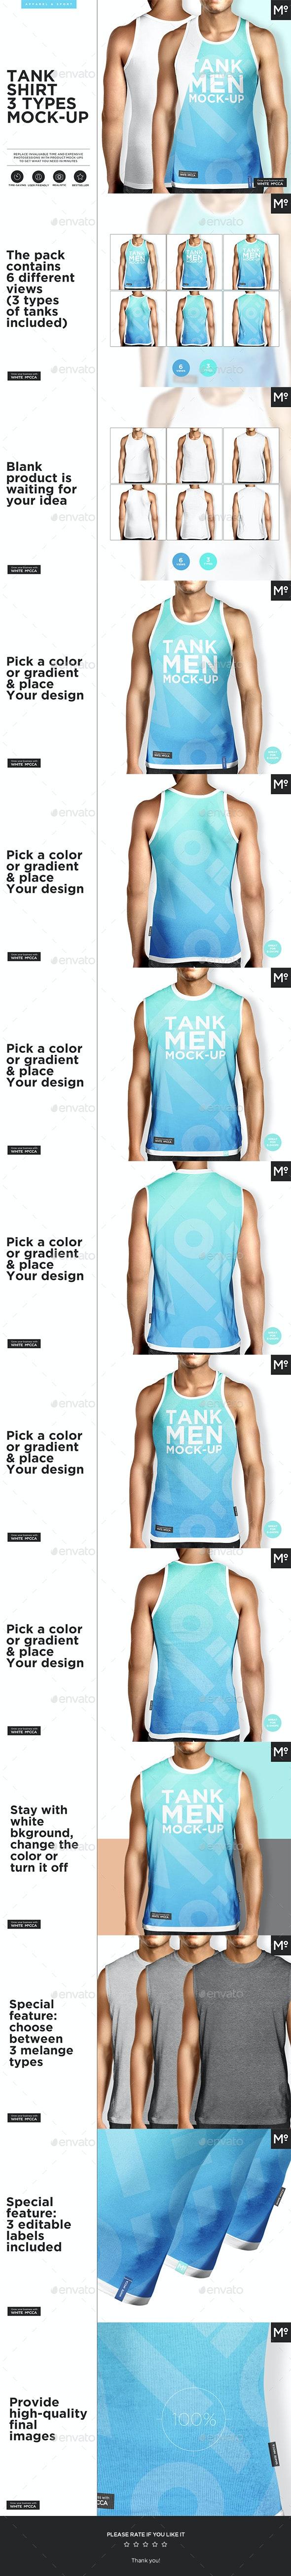 Tank Shirt 3 Types Mock-up - Miscellaneous Apparel